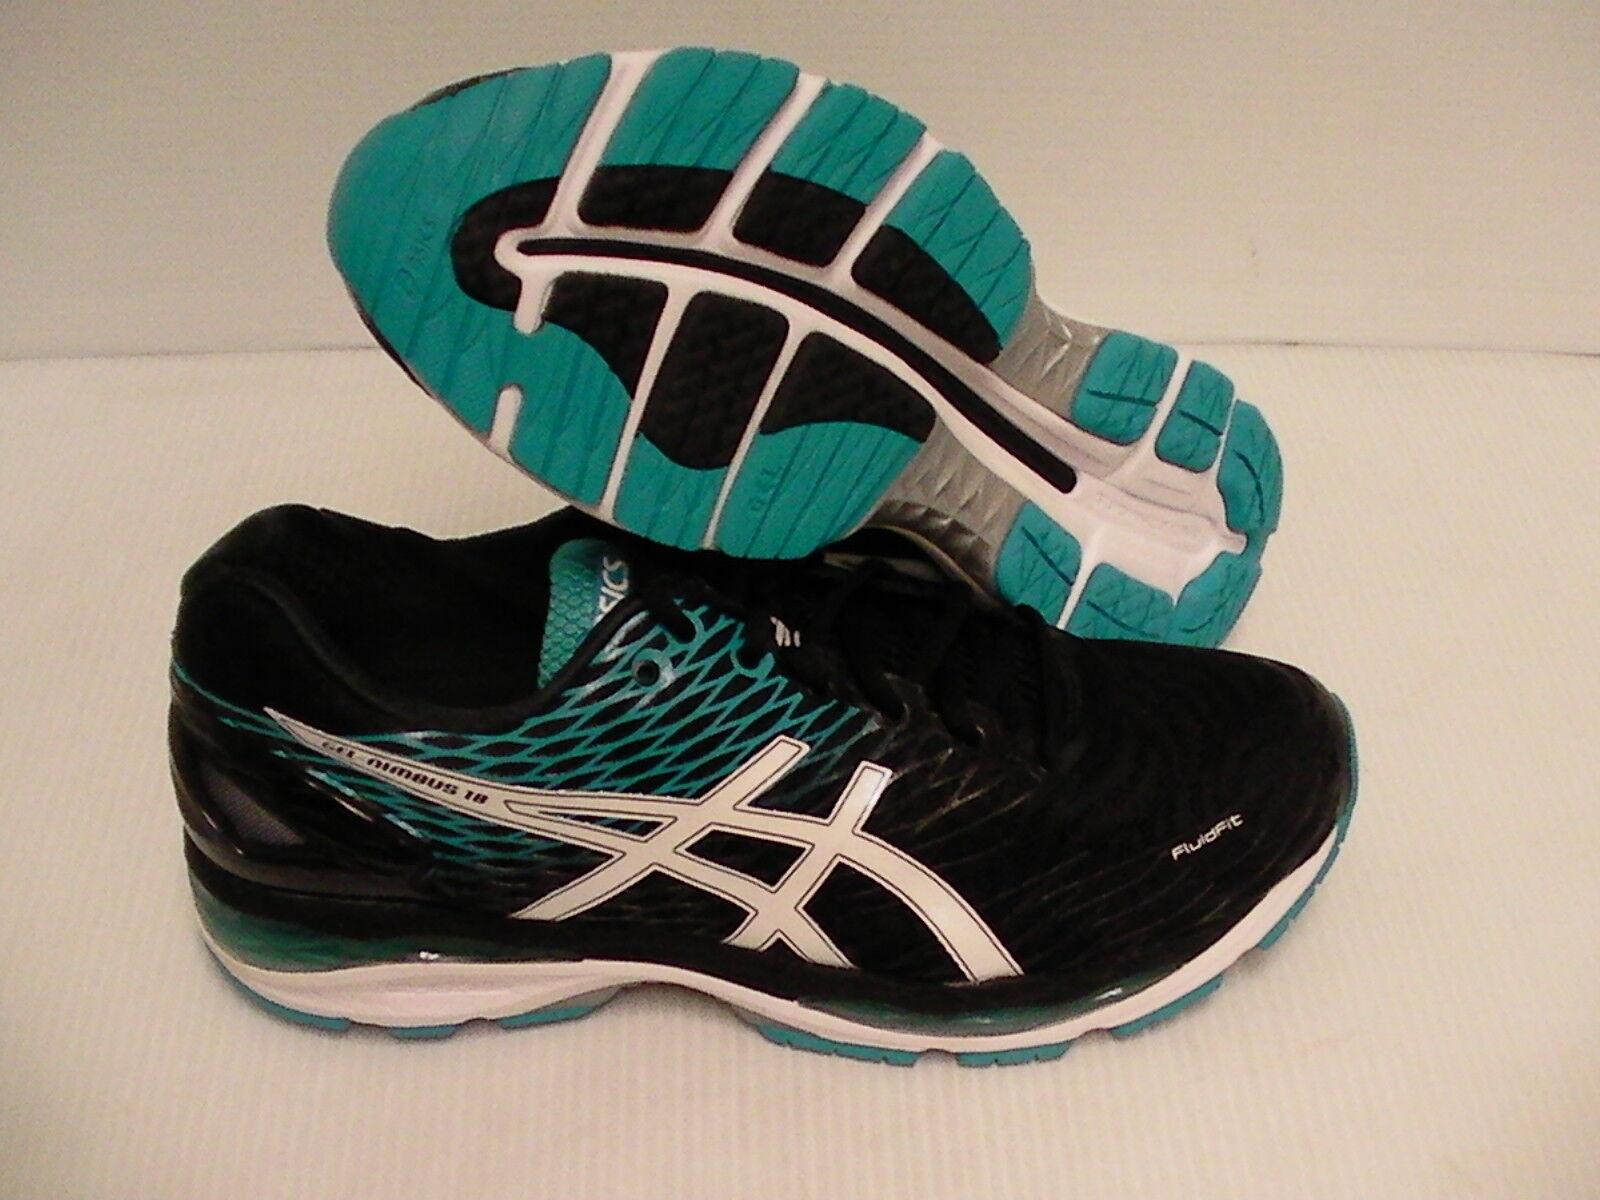 Asics gel nimbus 18 running shoes black white island blue size 15 men us new